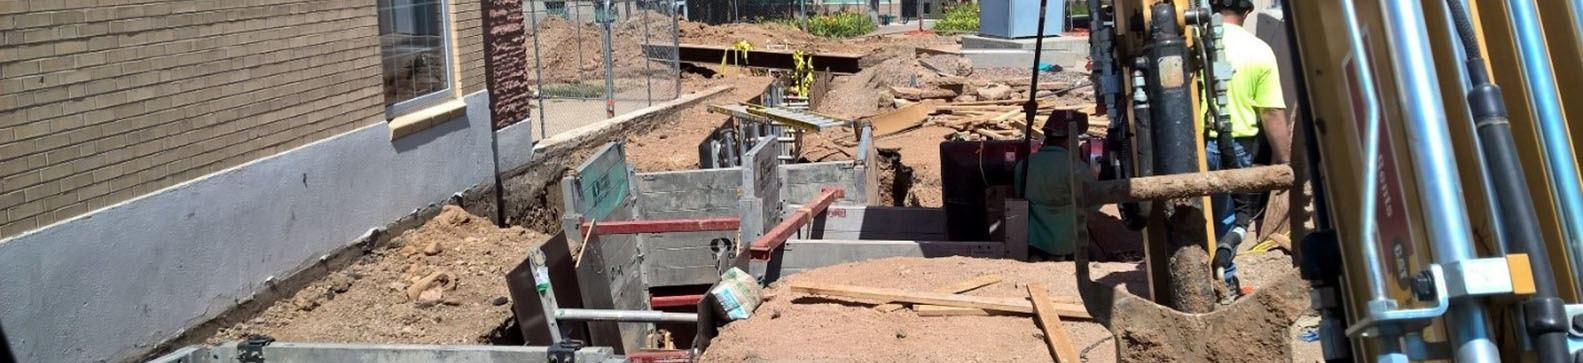 Colorado School of Mines Steam Line Repair